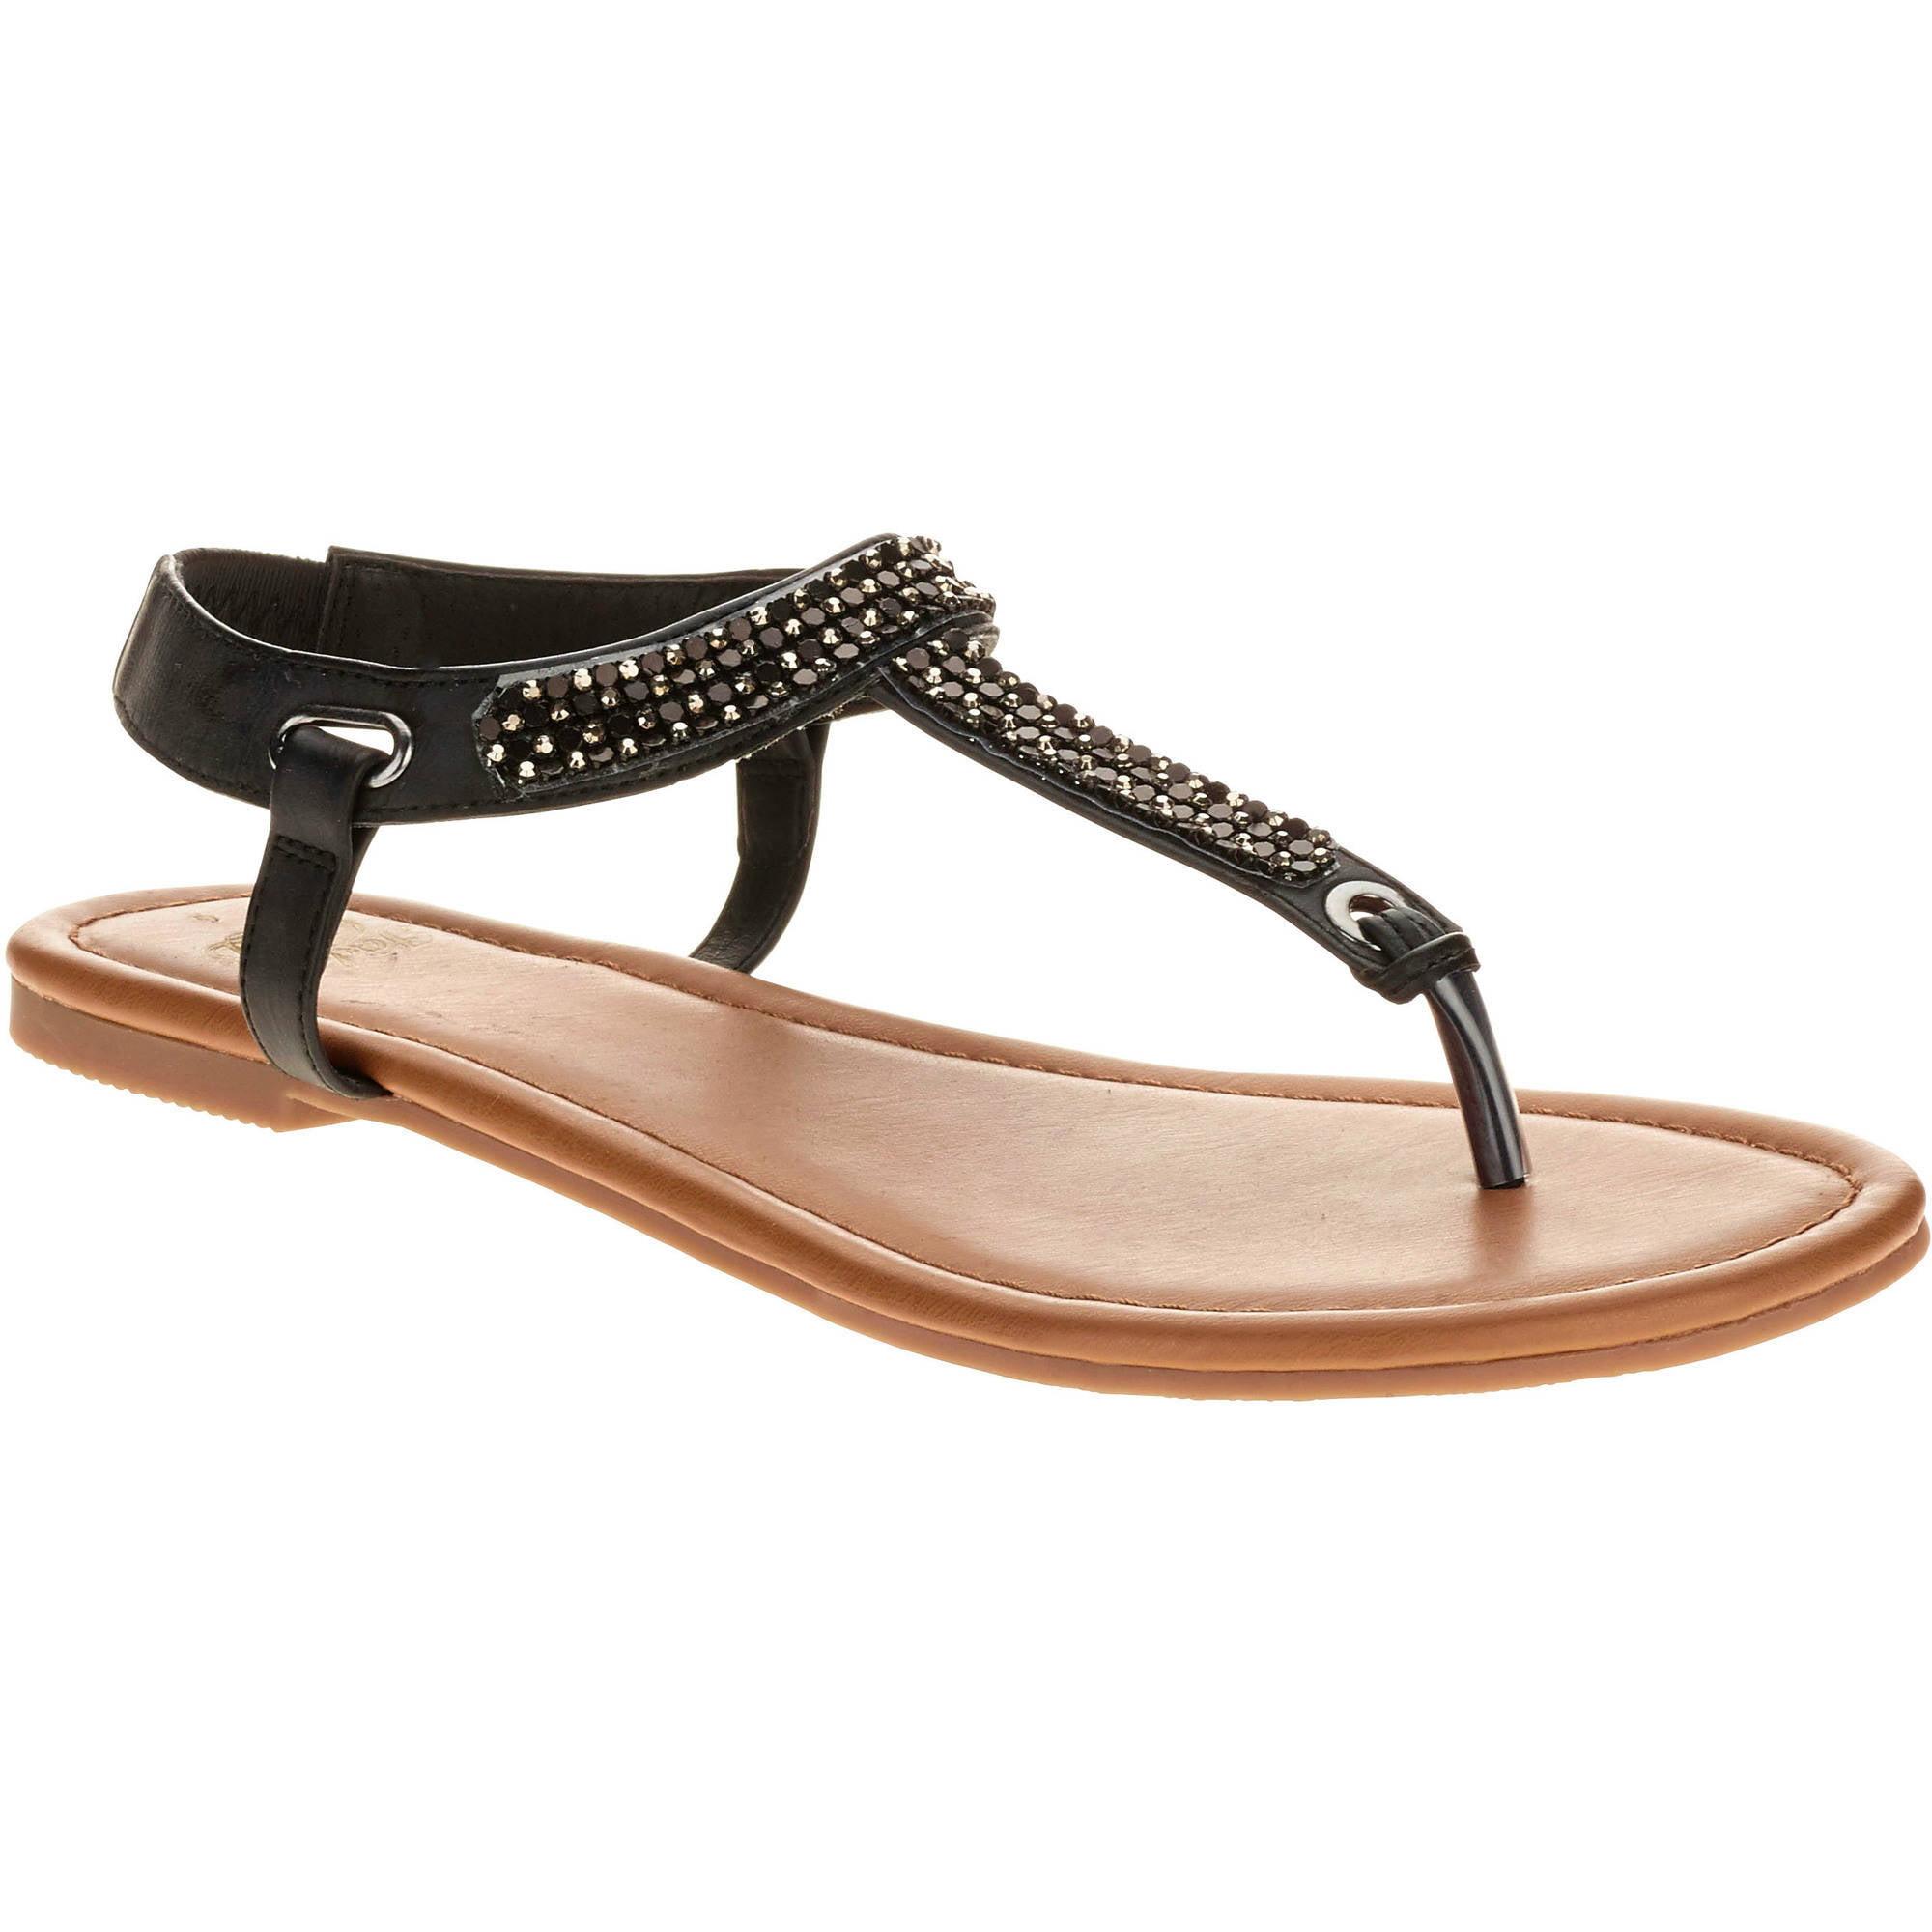 Faded Glory Women's Jewel Thong Sandal